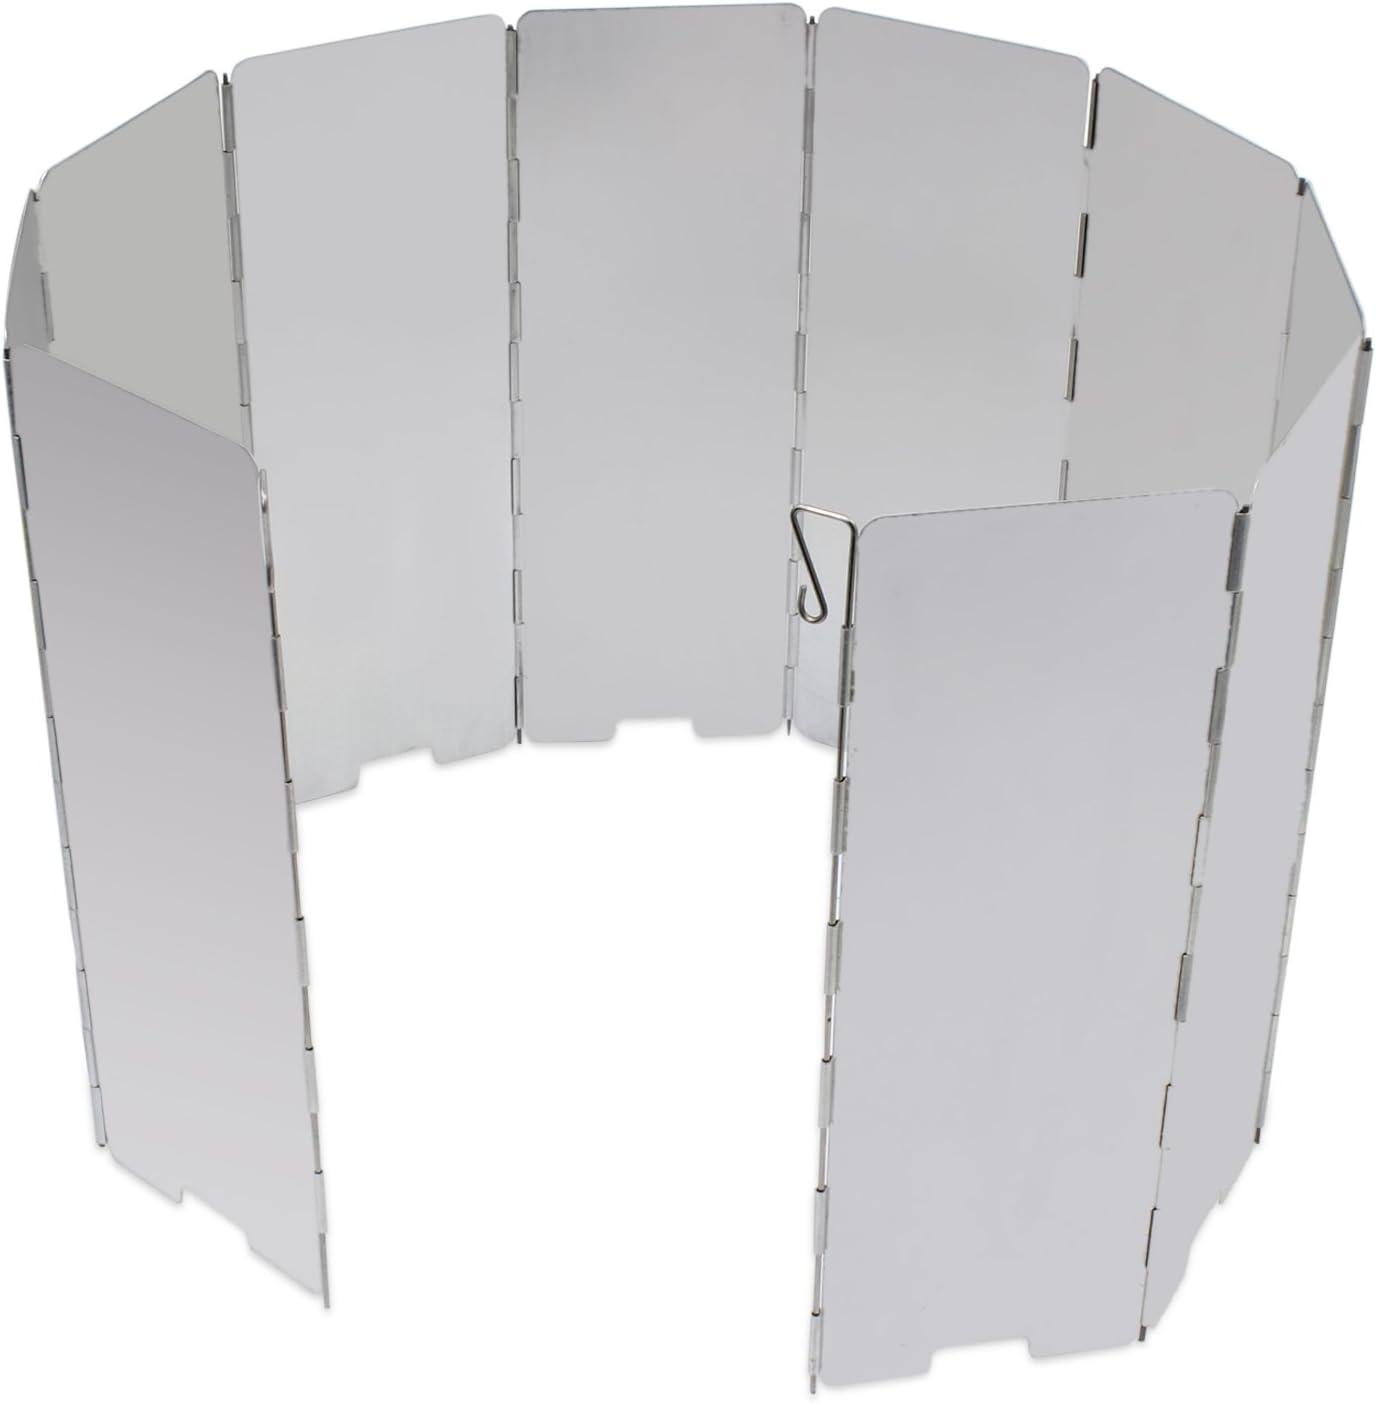 KEESIN al Aire Libre Camping Estufa Parabrisas 10 Platos Plegable Cocina de Aluminio Parabrisas para Picnic